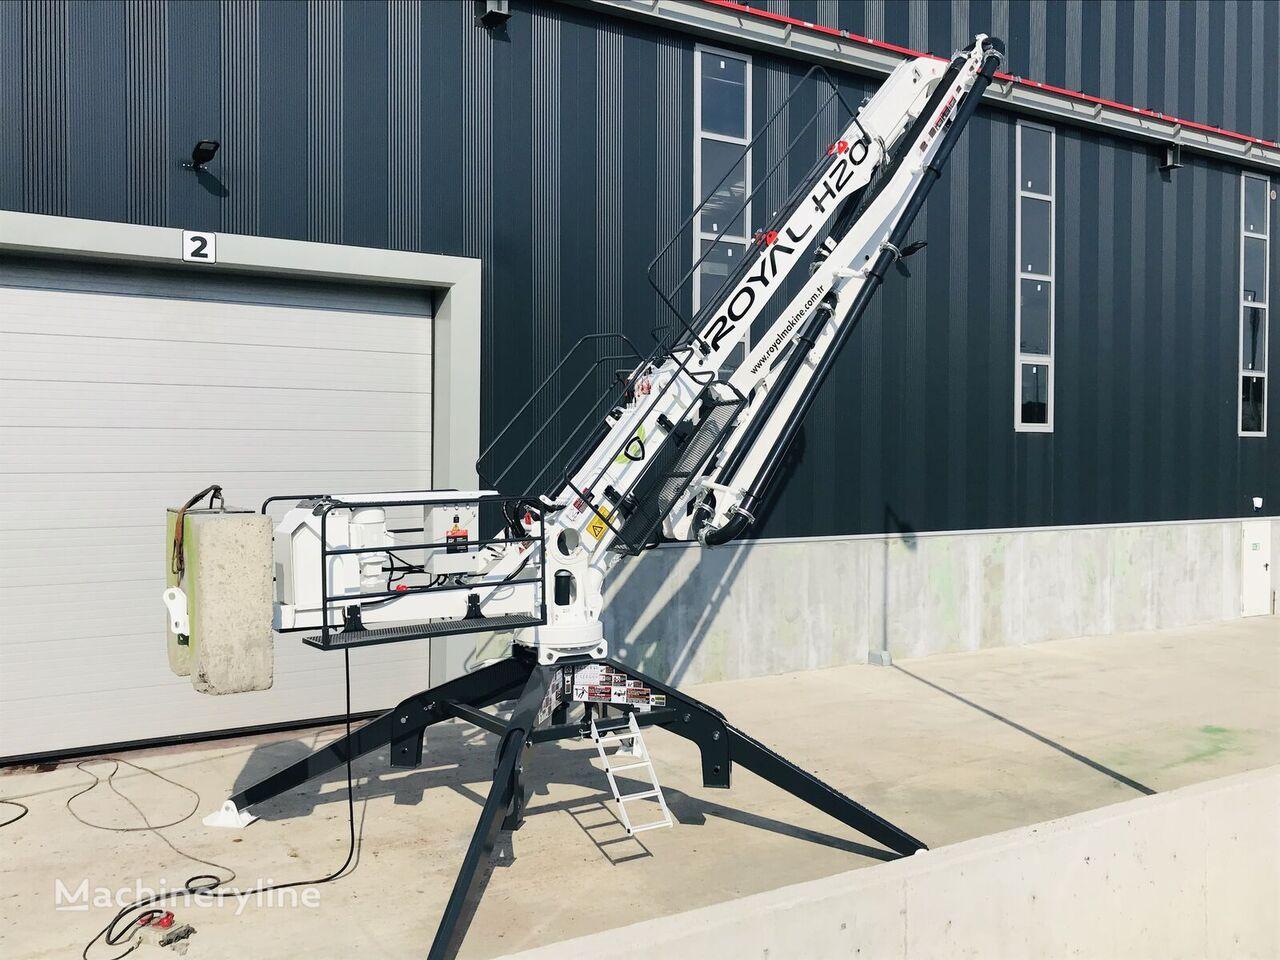 ny ROYALMAC HD20 R3 SPIDER PLACING BOOM betong distribusjon pumpe